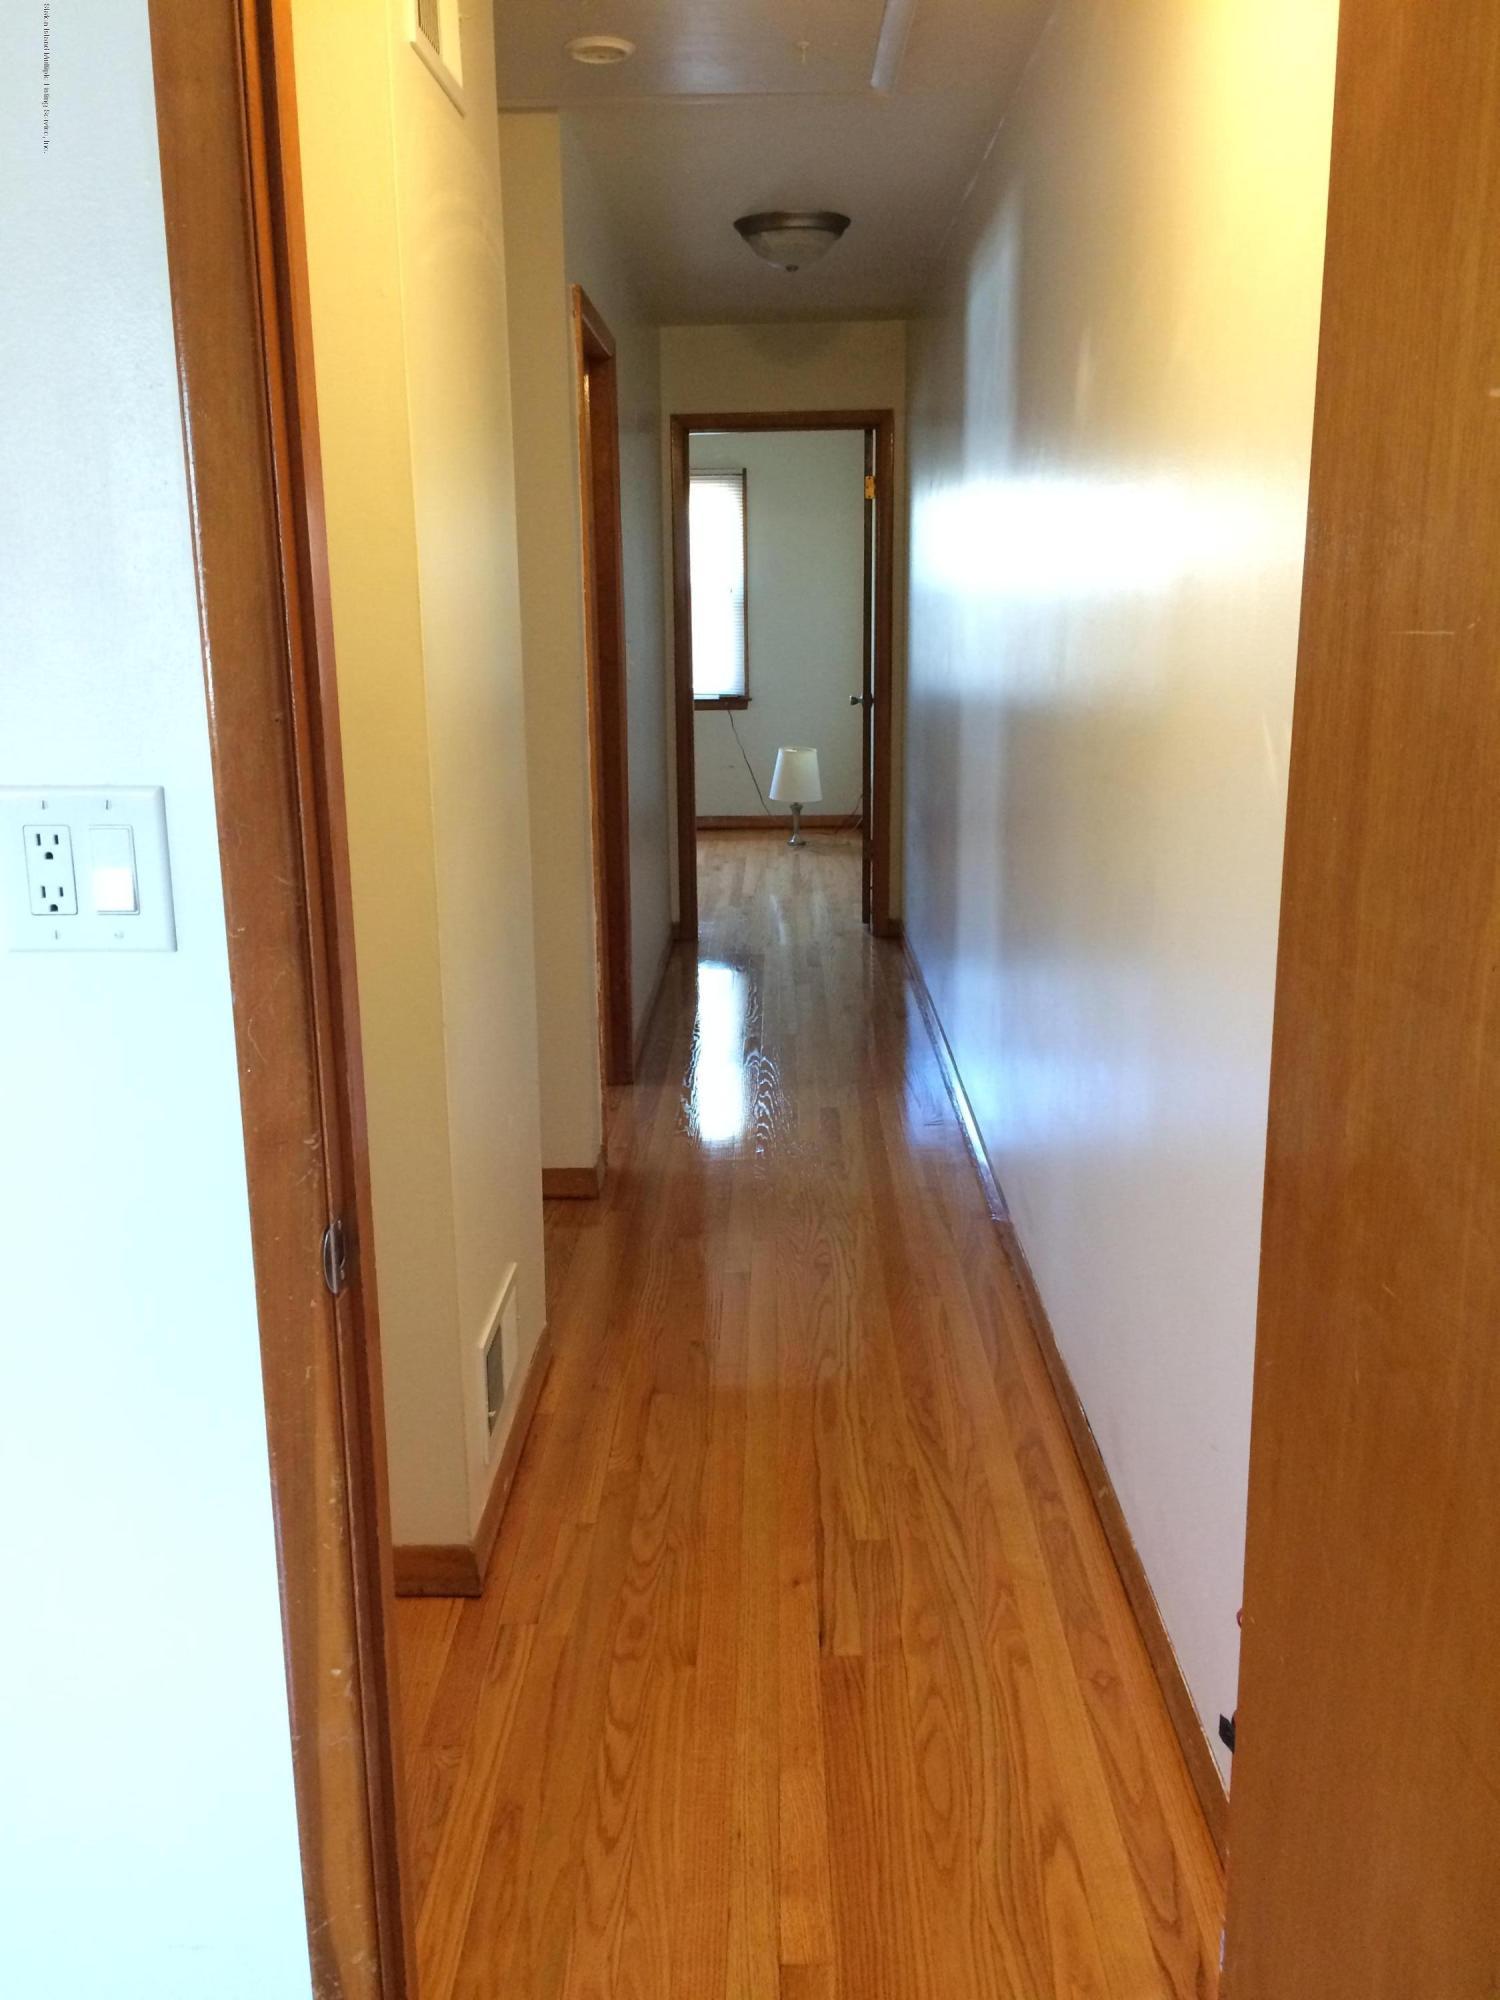 Single Family - Semi-Attached 30 Bent Street  Staten Island, NY 10312, MLS-1130498-5